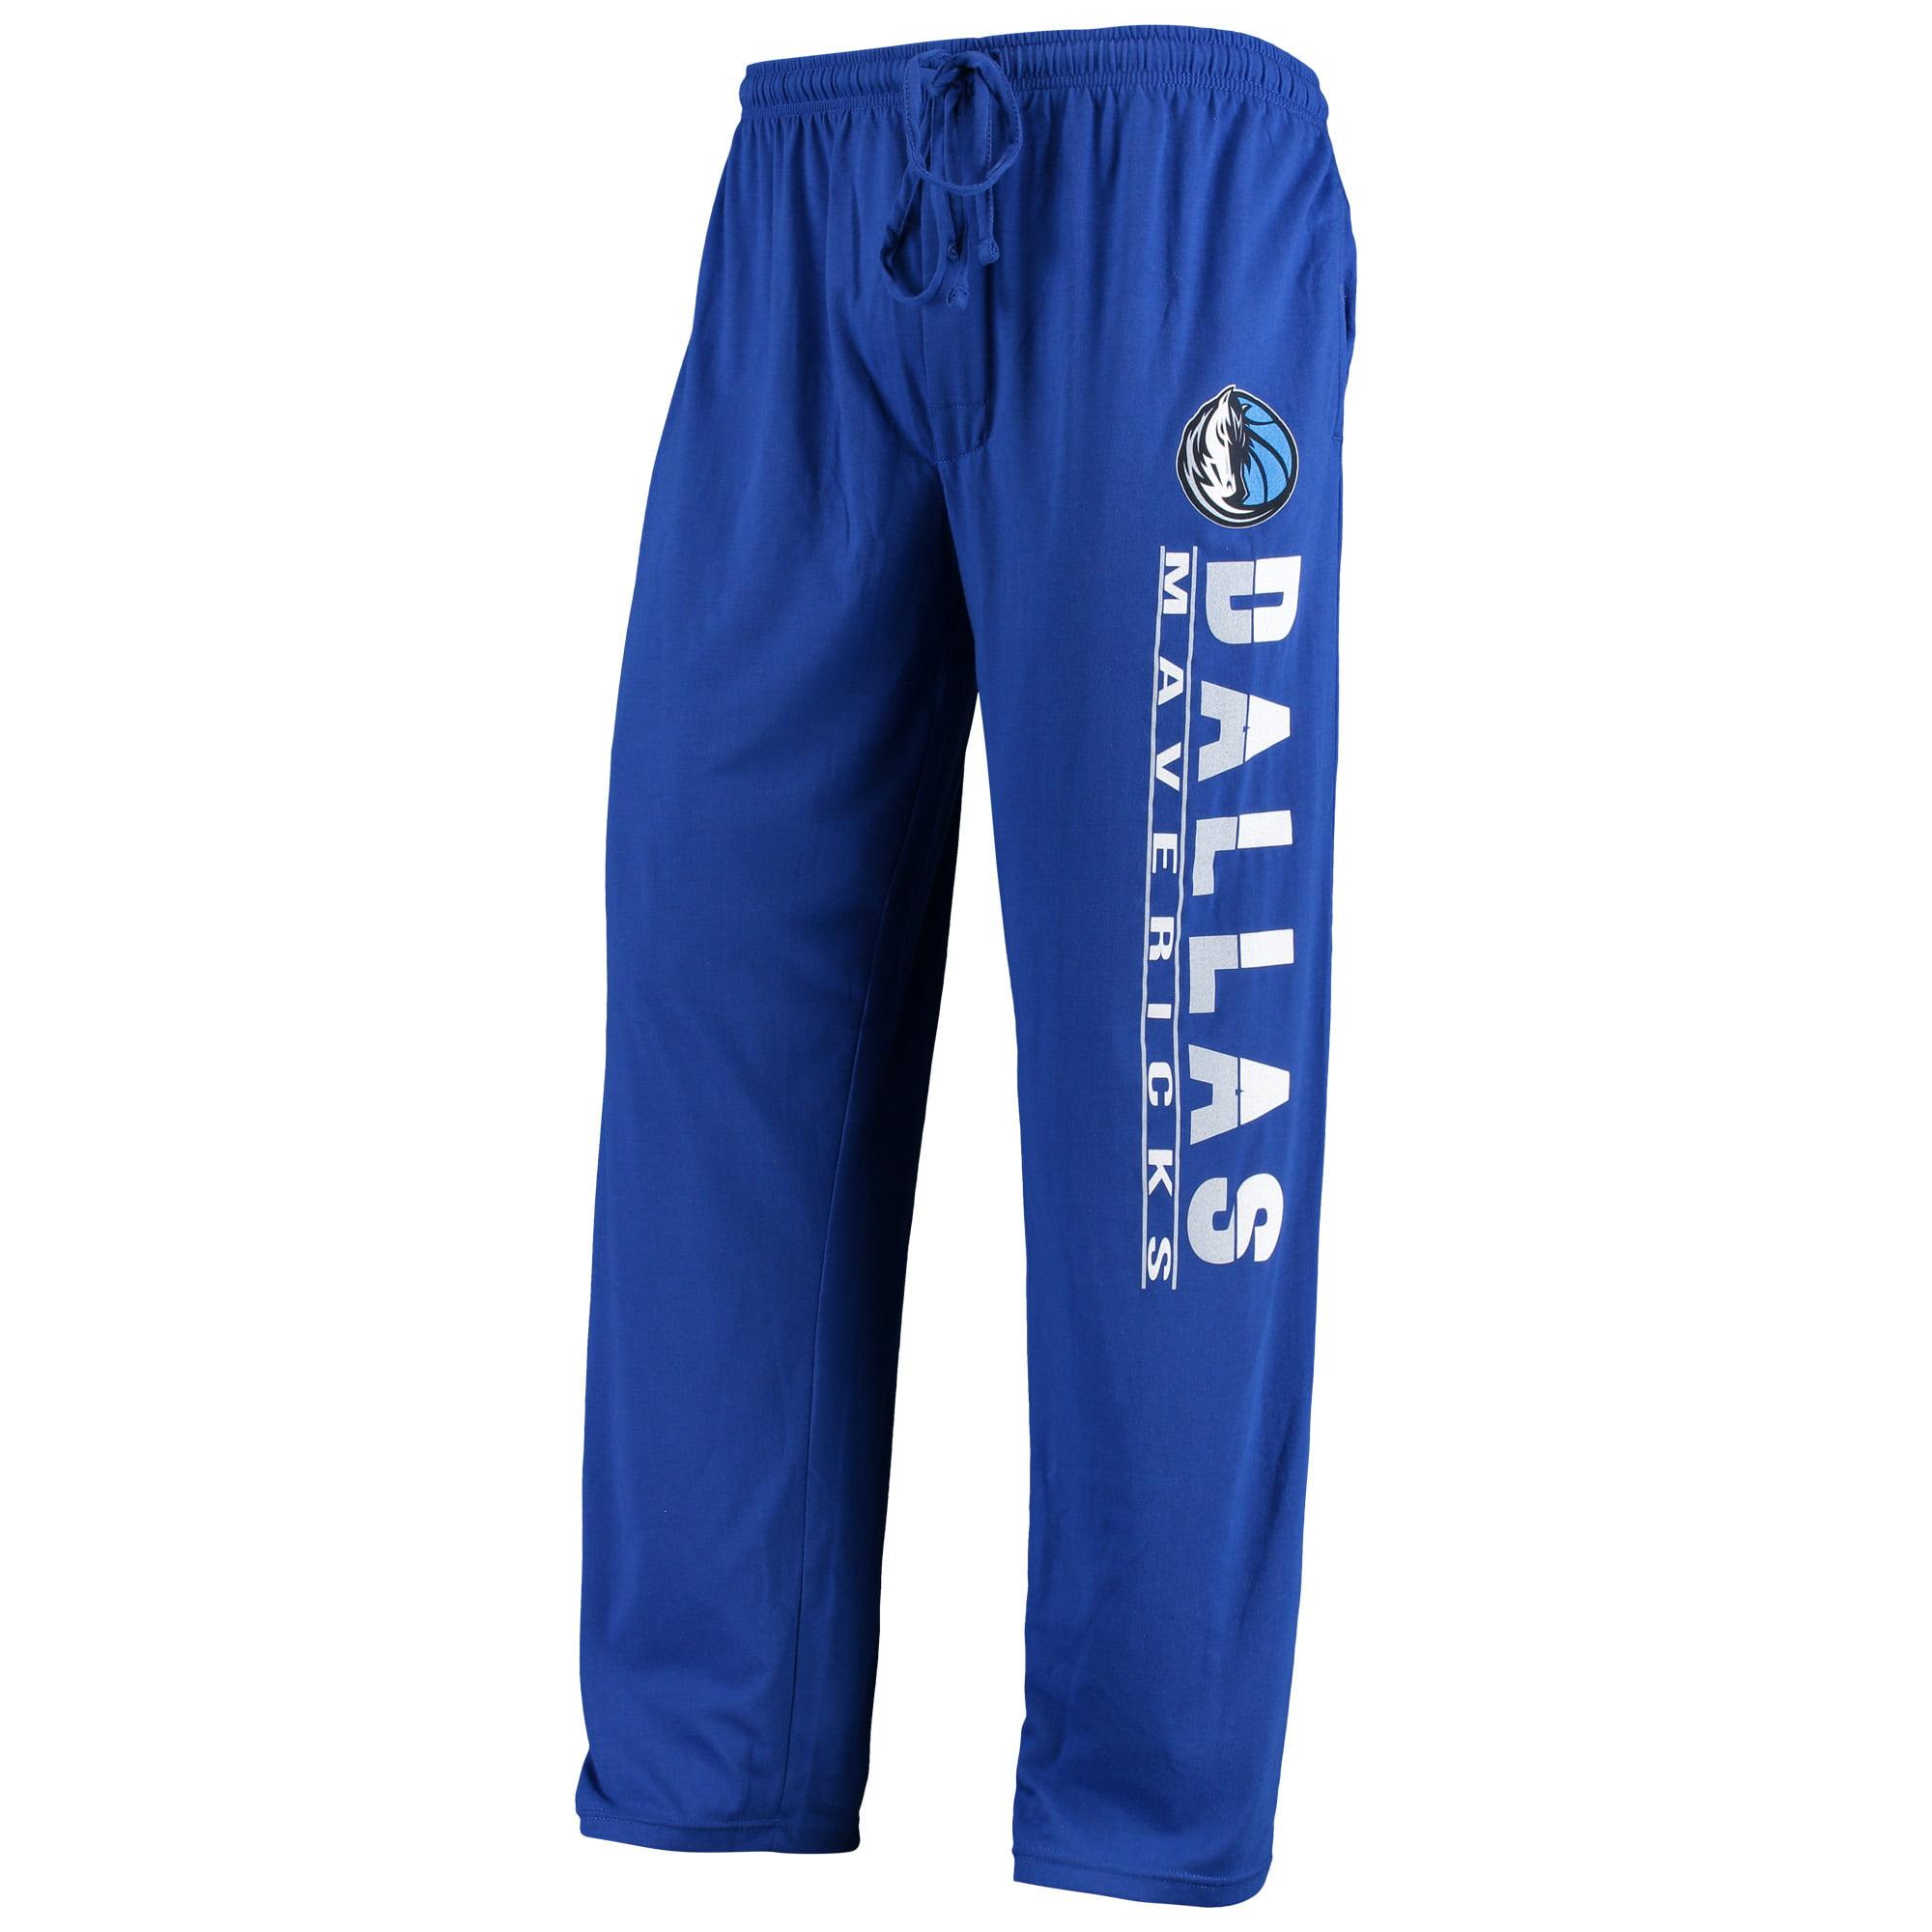 Dallas Mavericks Concepts Sport Solid Knit Pants - Blue